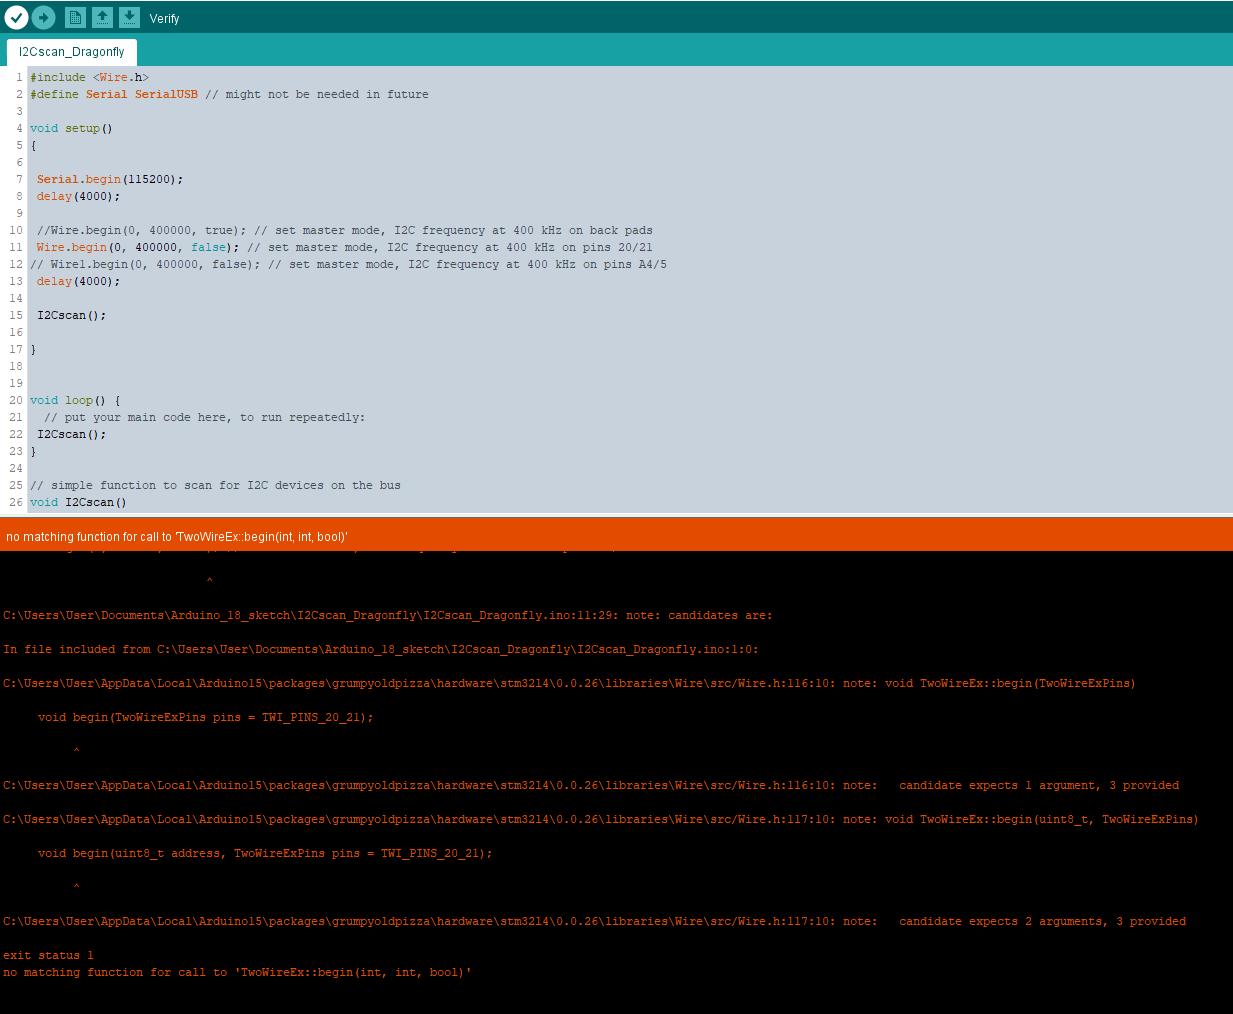 I2C issue · Issue #35 · GrumpyOldPizza/arduino-STM32L4 · GitHub